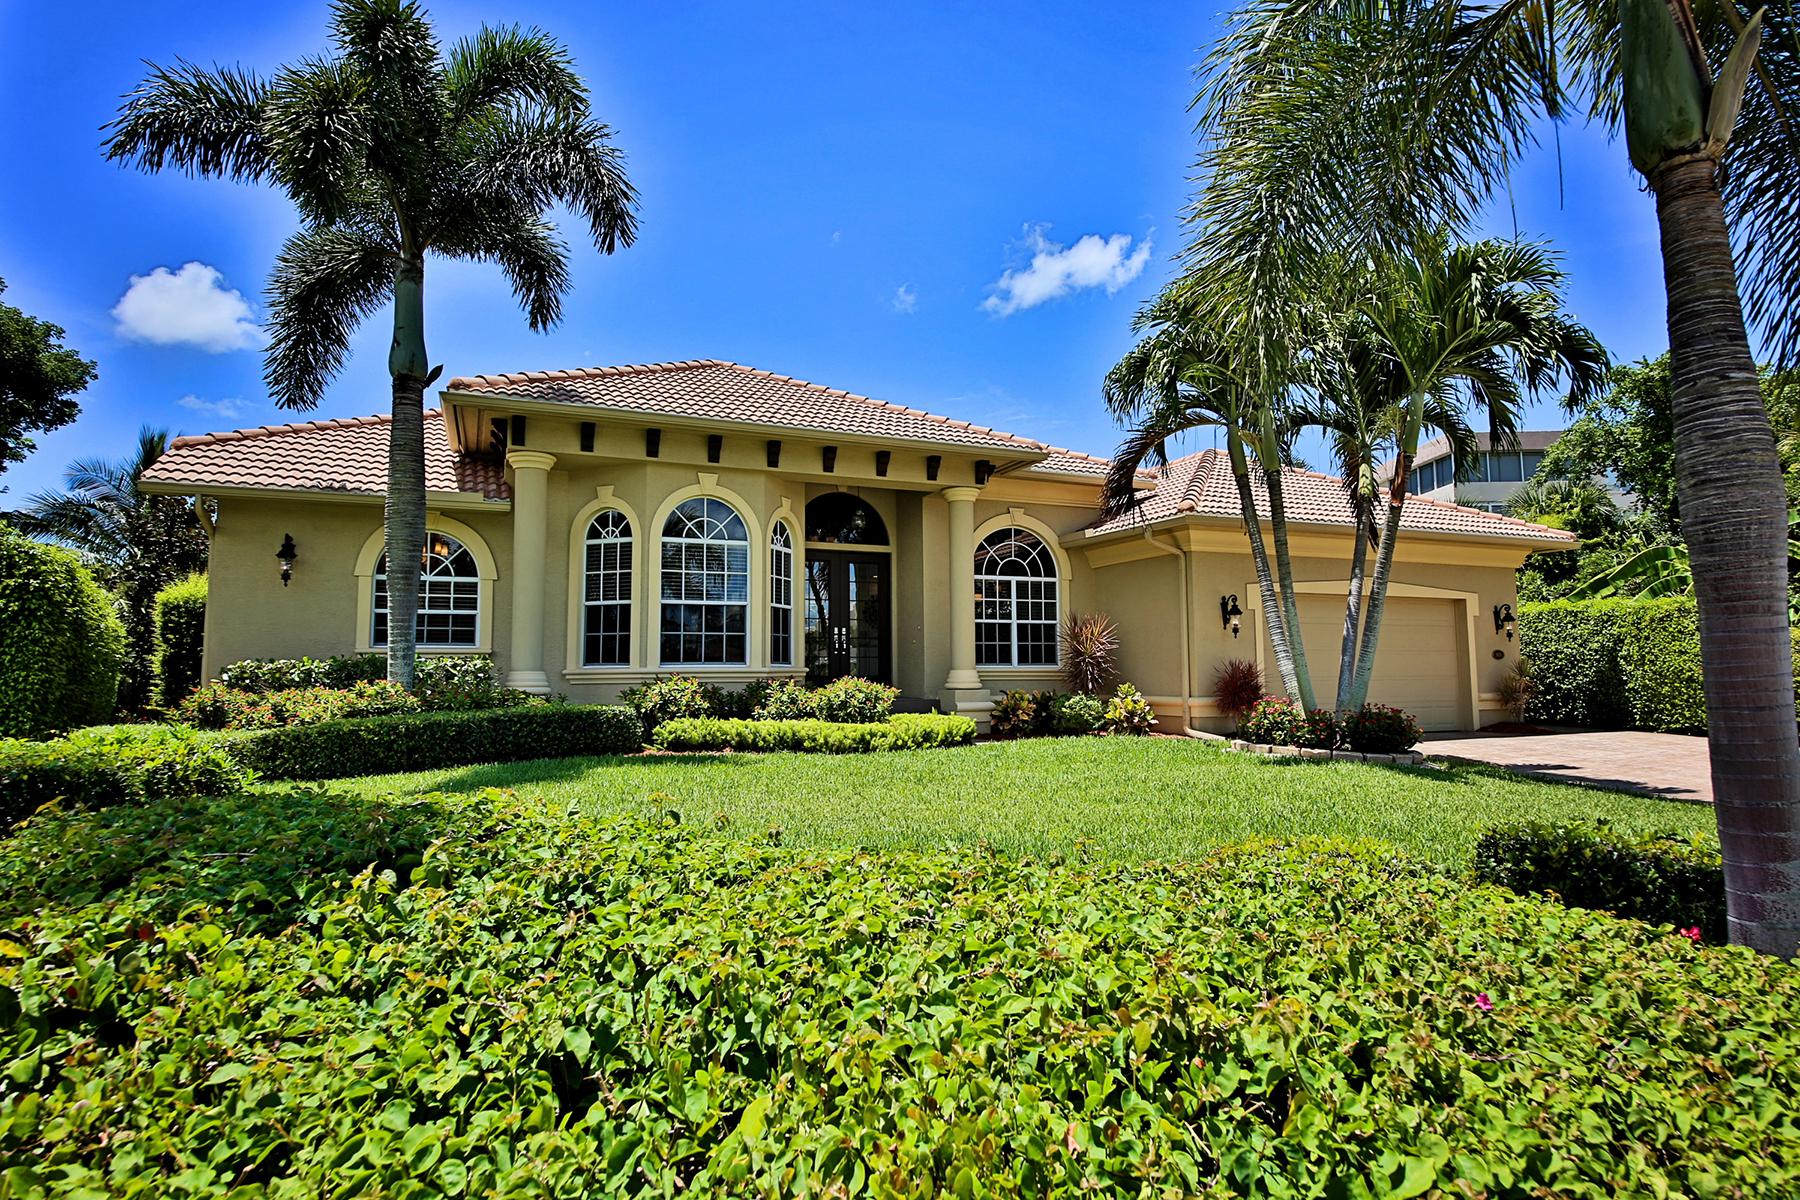 獨棟家庭住宅 為 出售 在 MARCO ISLAND - SWAN DRIVE 905 Swan Dr Marco Island, 佛羅里達州 34145 美國